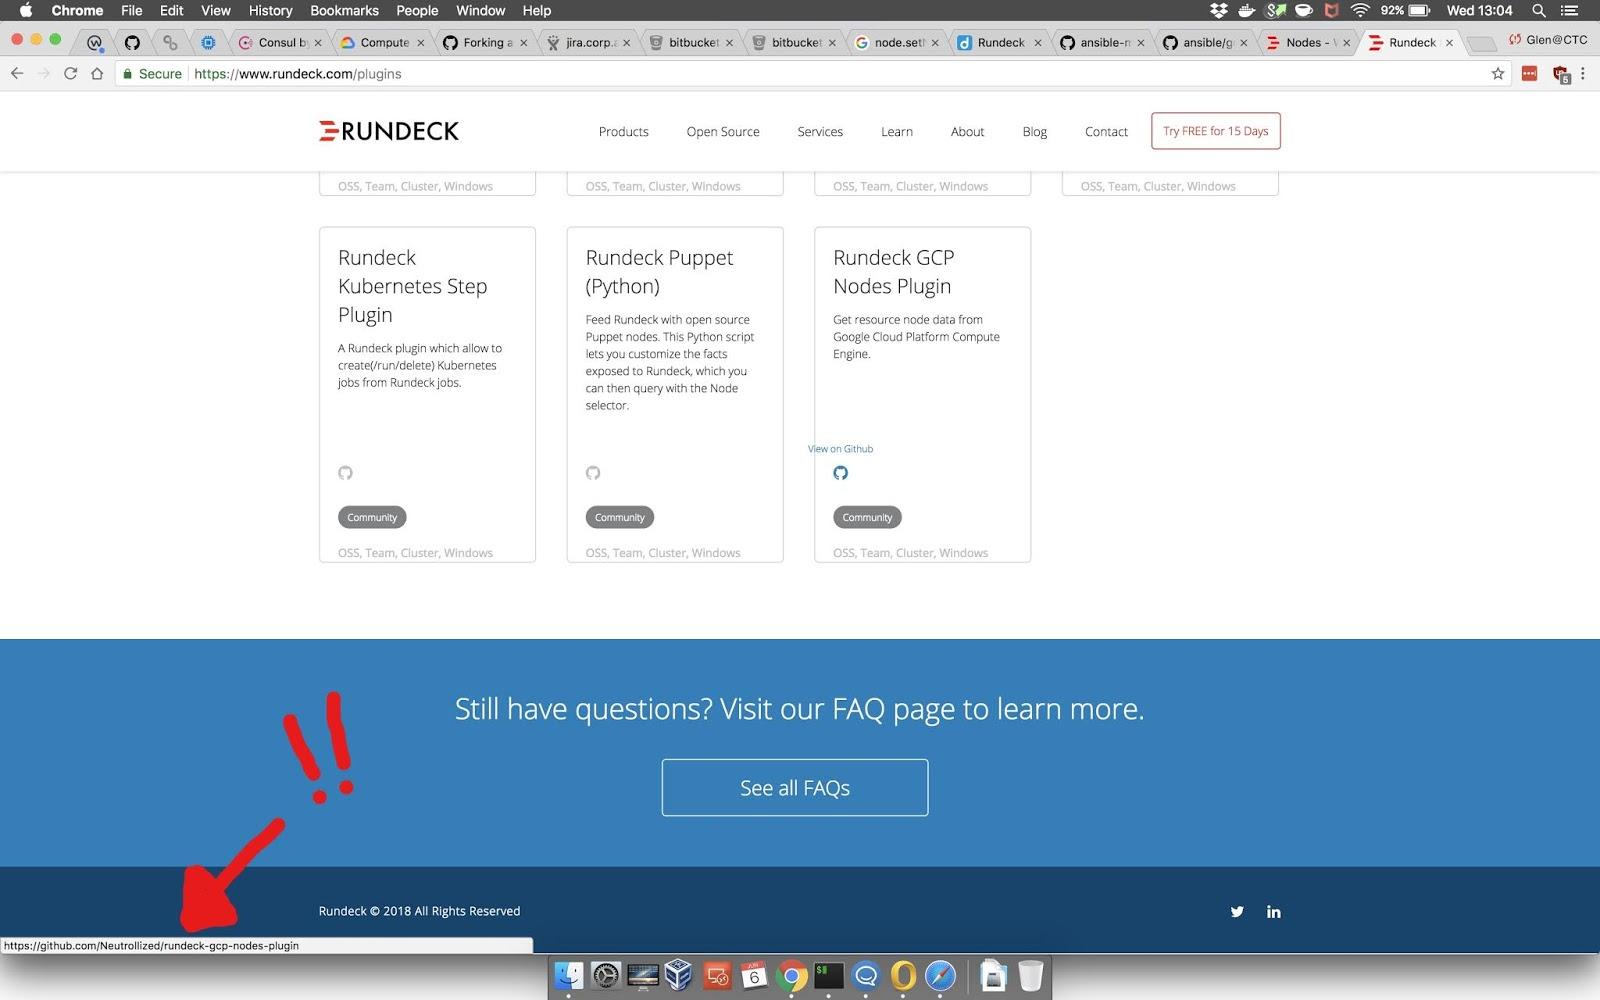 Rundeck & GCP | My SysAdmin/DevOps Journey